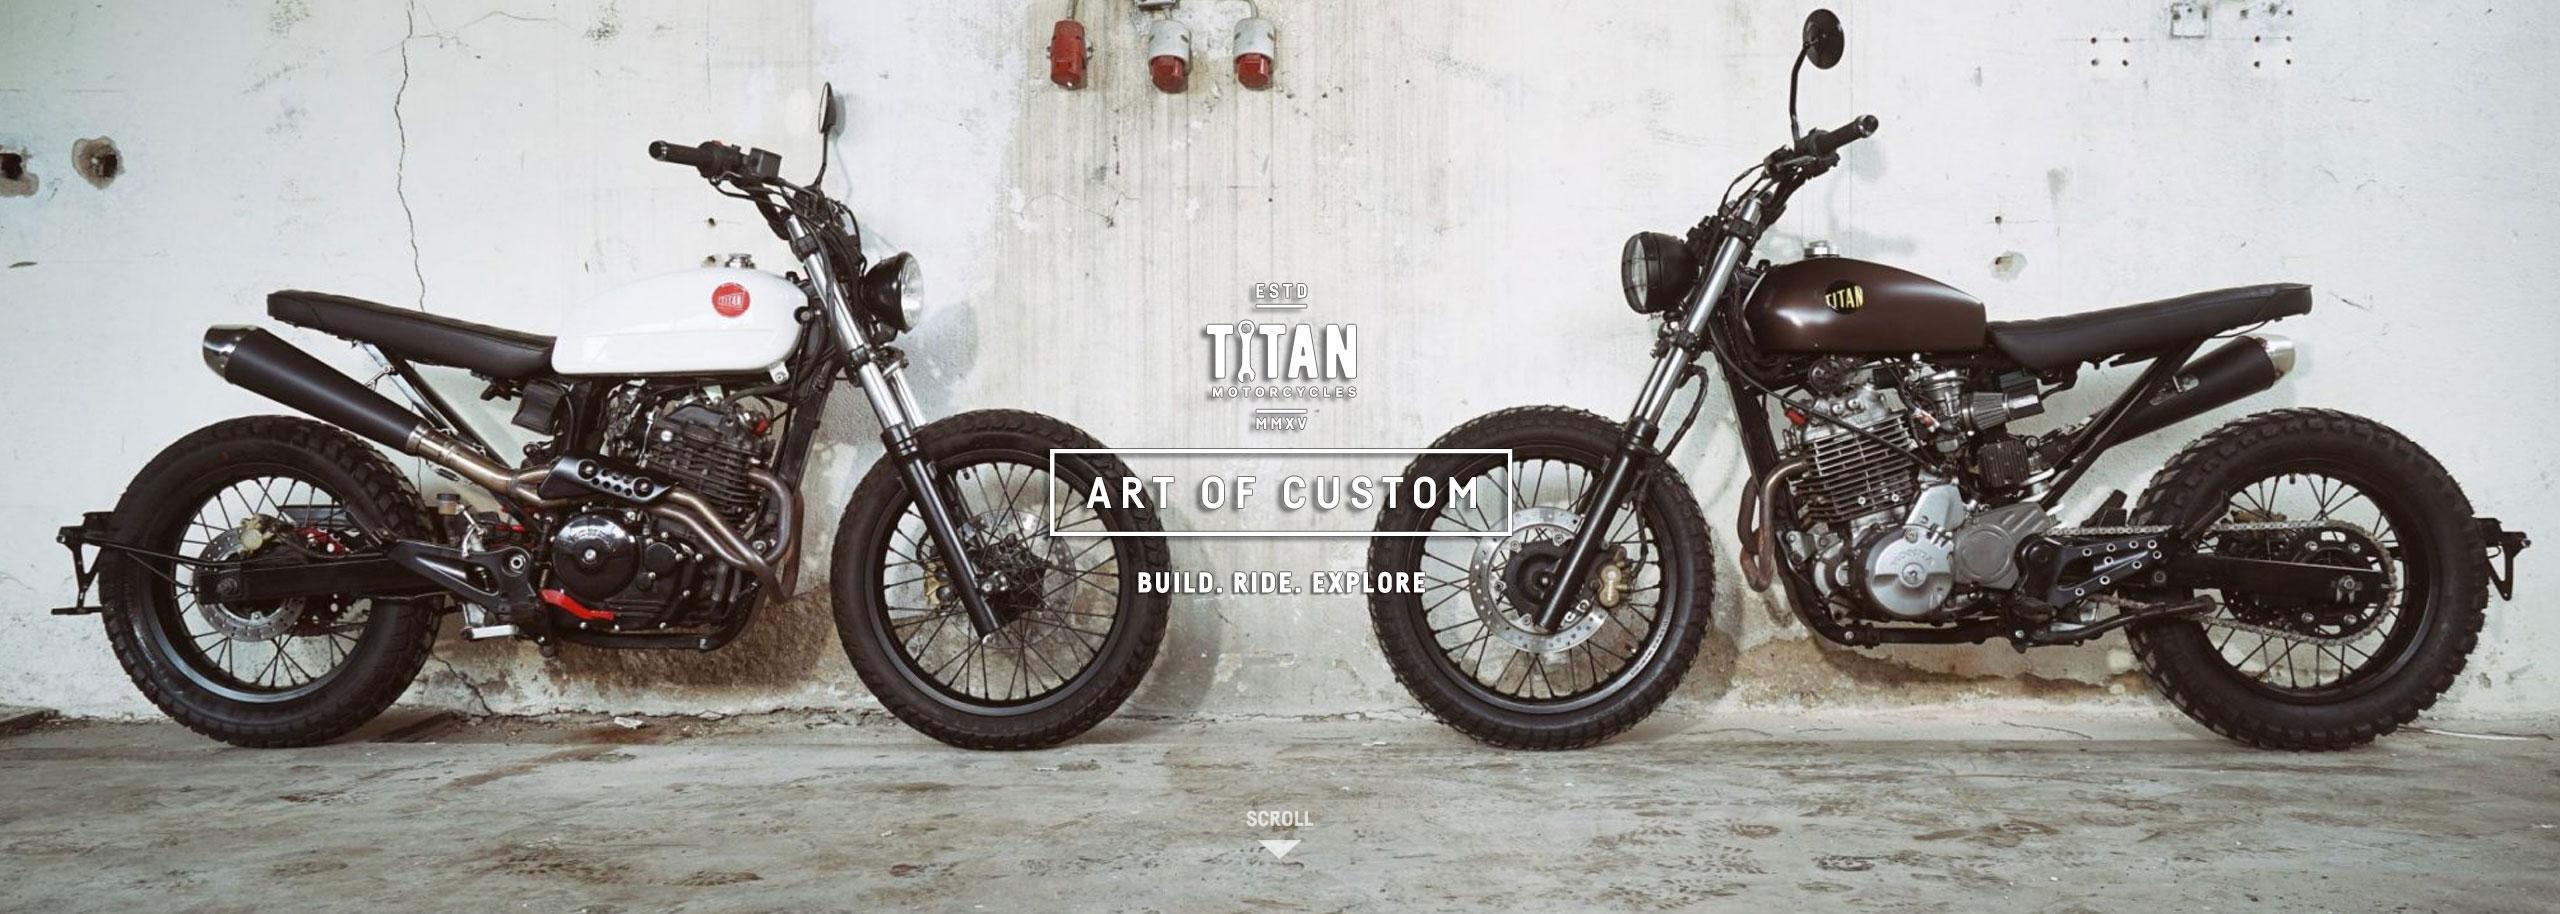 01_TITAN-Duet-of-Trackers-Honda-Umbau-Graz-Tracker-Scrambler-Cafe-Racer-SLR-650-Vigor-Styiran-Design